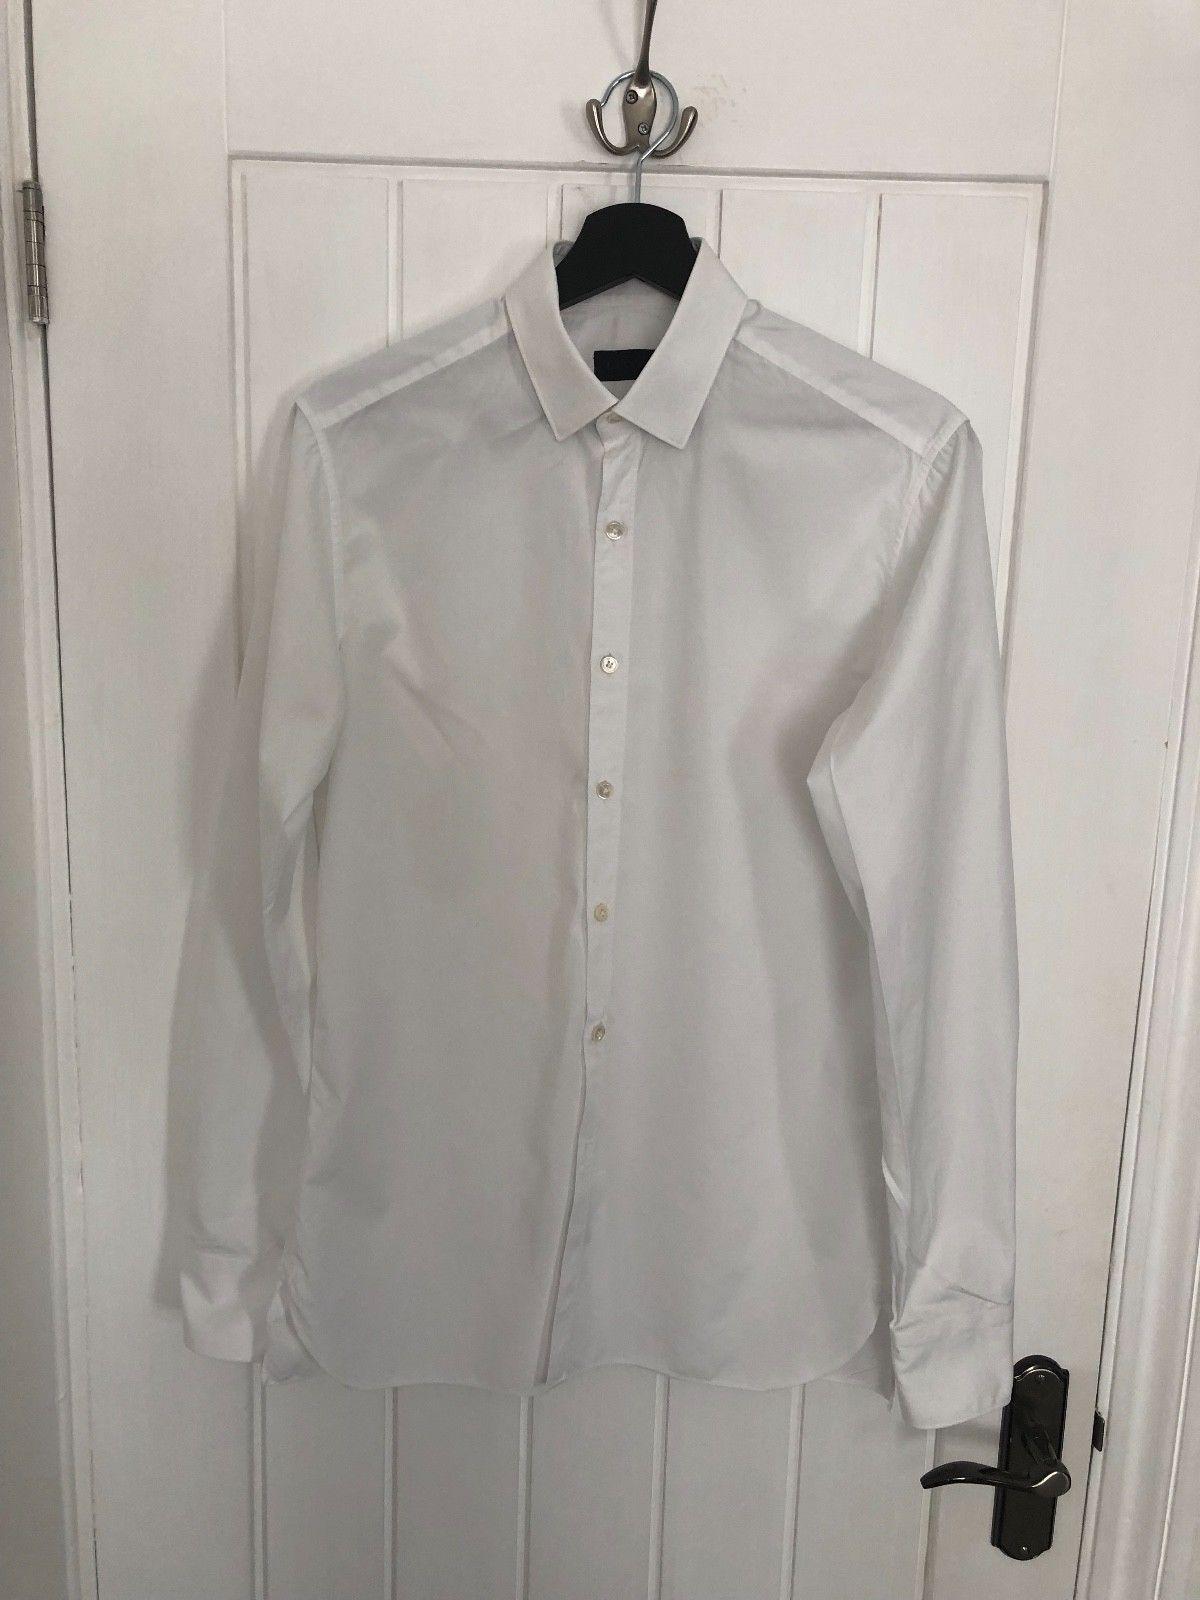 LANVIN Uomo SLIM-FIT SHIRT bianca Dimensione COLLAR 15.5'' 15.5'' 15.5'' (39) 63ff40